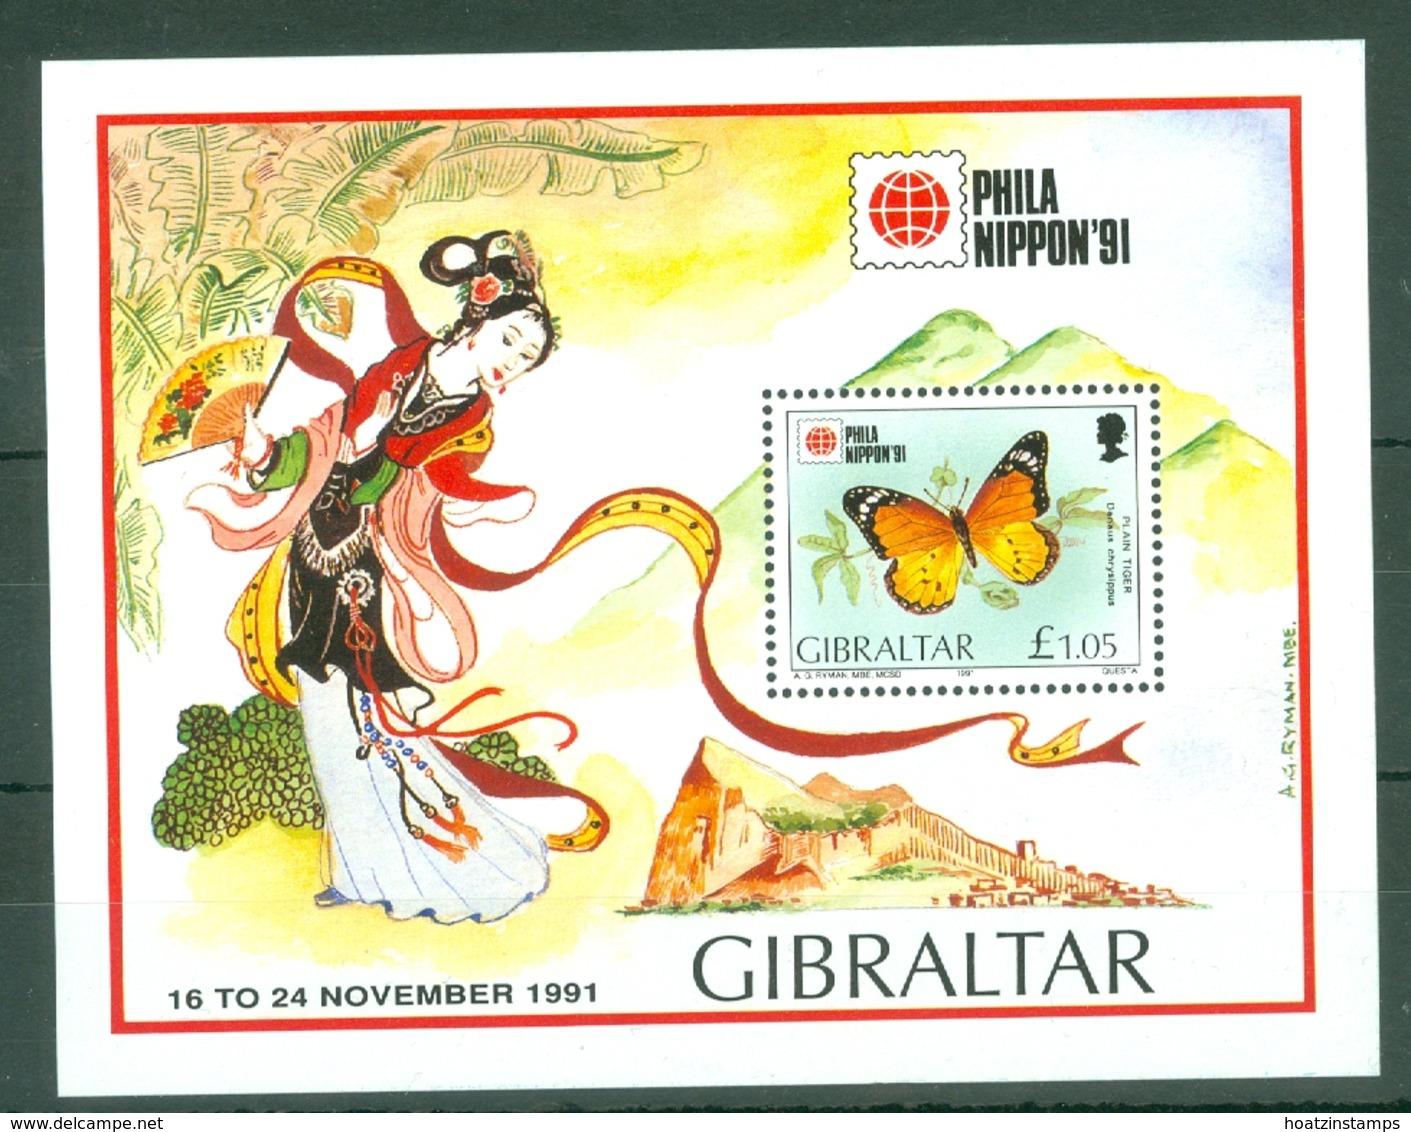 Gibraltar: 1991   Phila Nippon 91 International Stamp Exhibition   M/S    MNH - Gibilterra